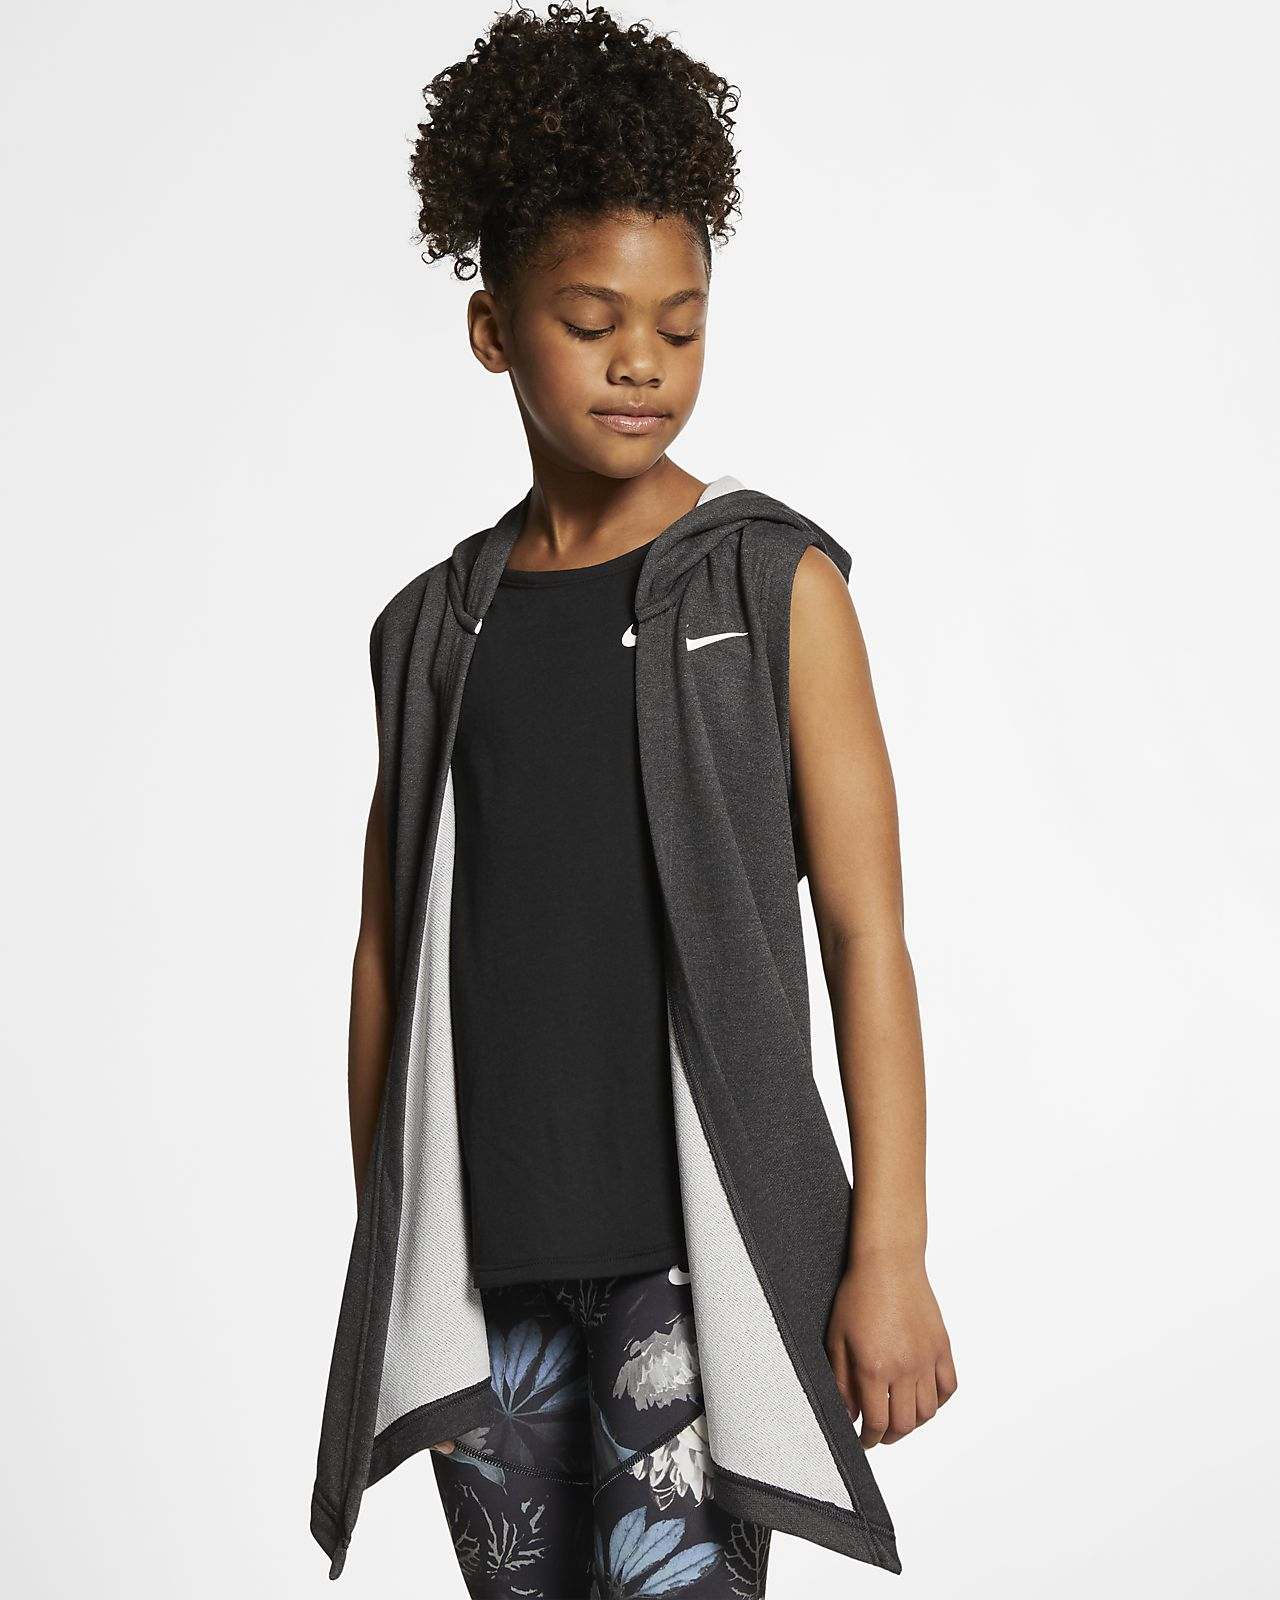 Chaleco de entrenamiento con capucha para niña talla grande Nike